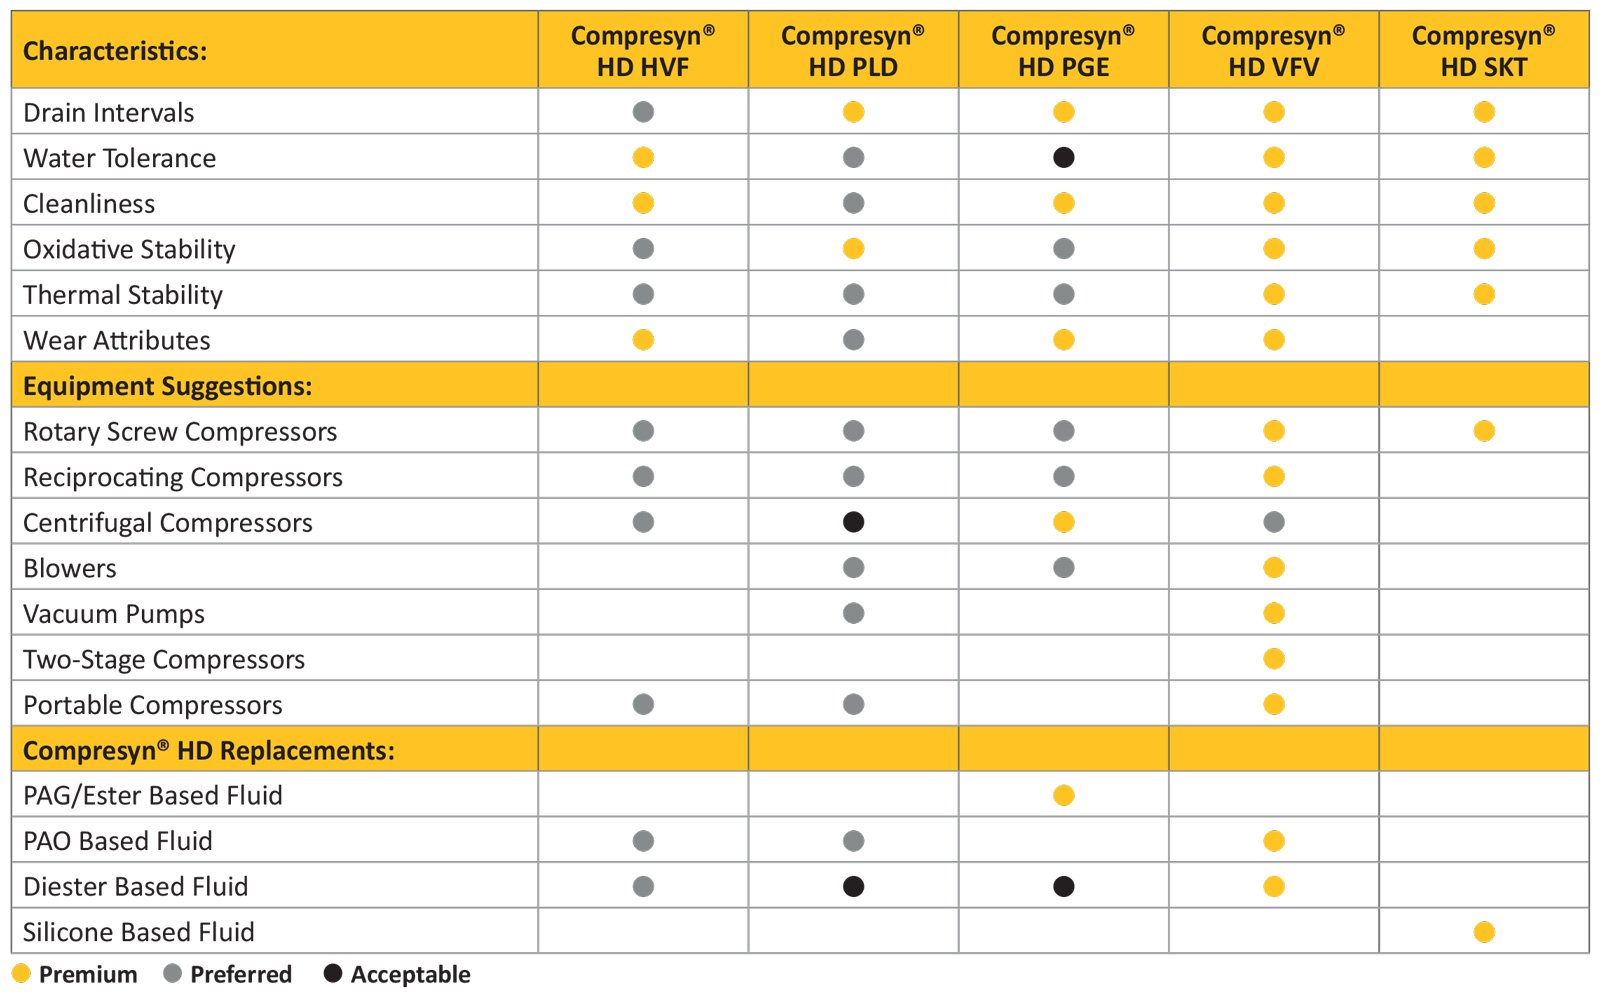 Compresyn HD Product Comparison Chart